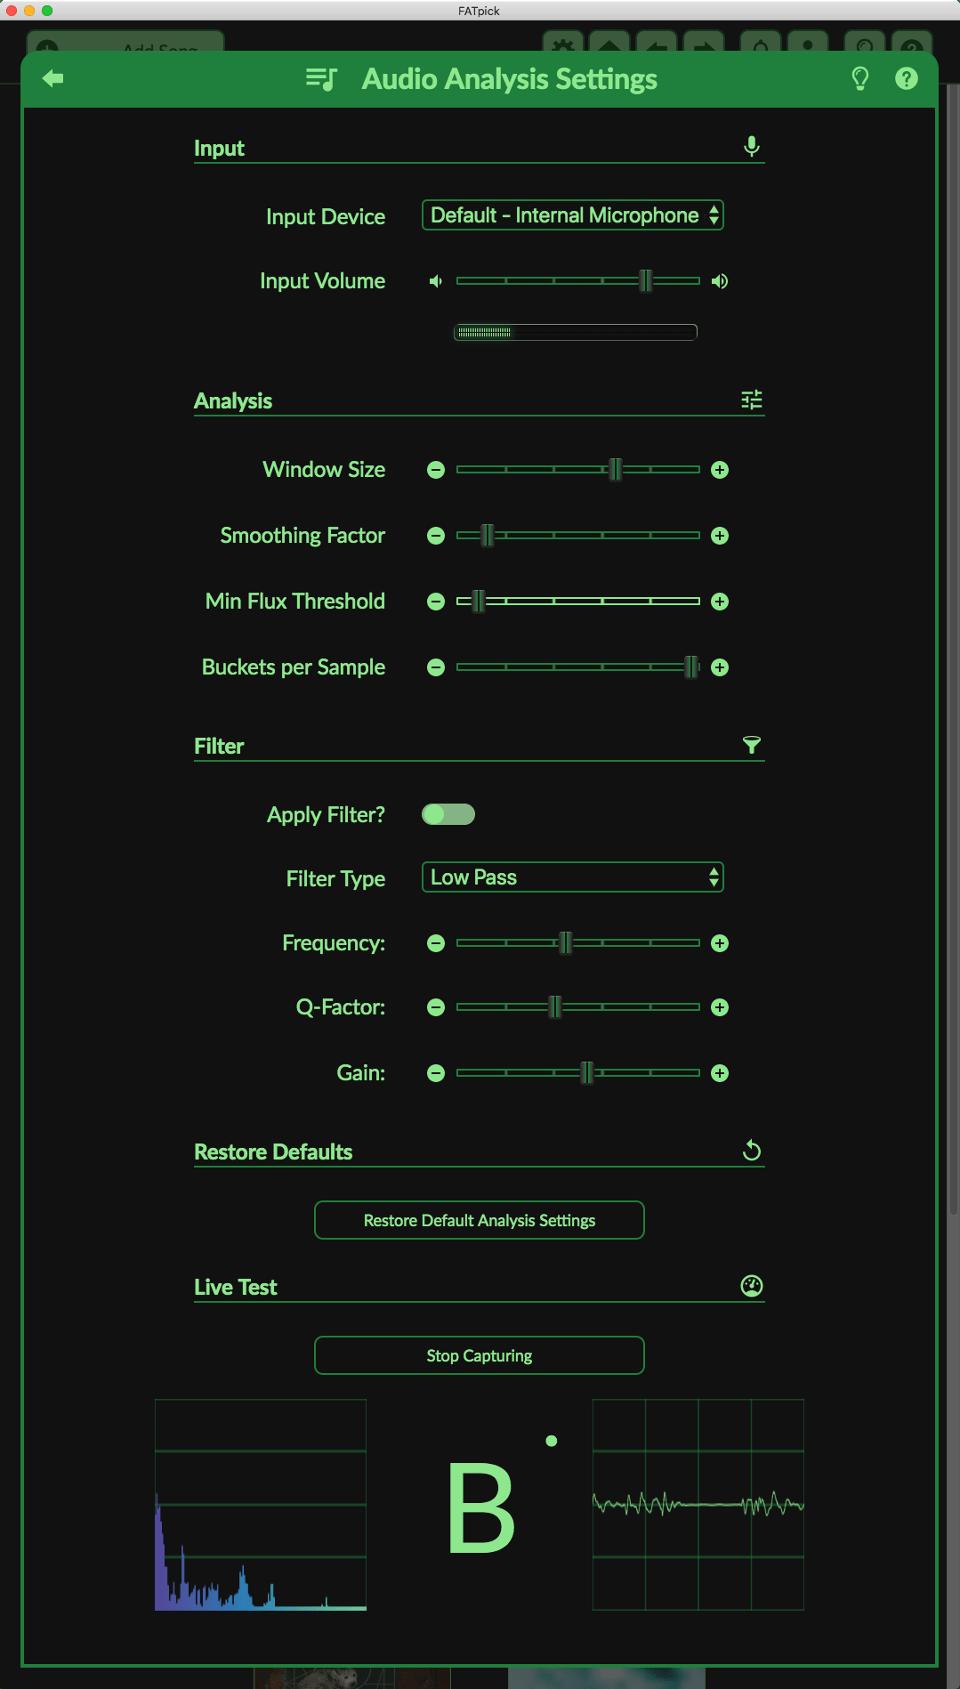 Screenshot of the Advanced Audio Analysis Settings Panel